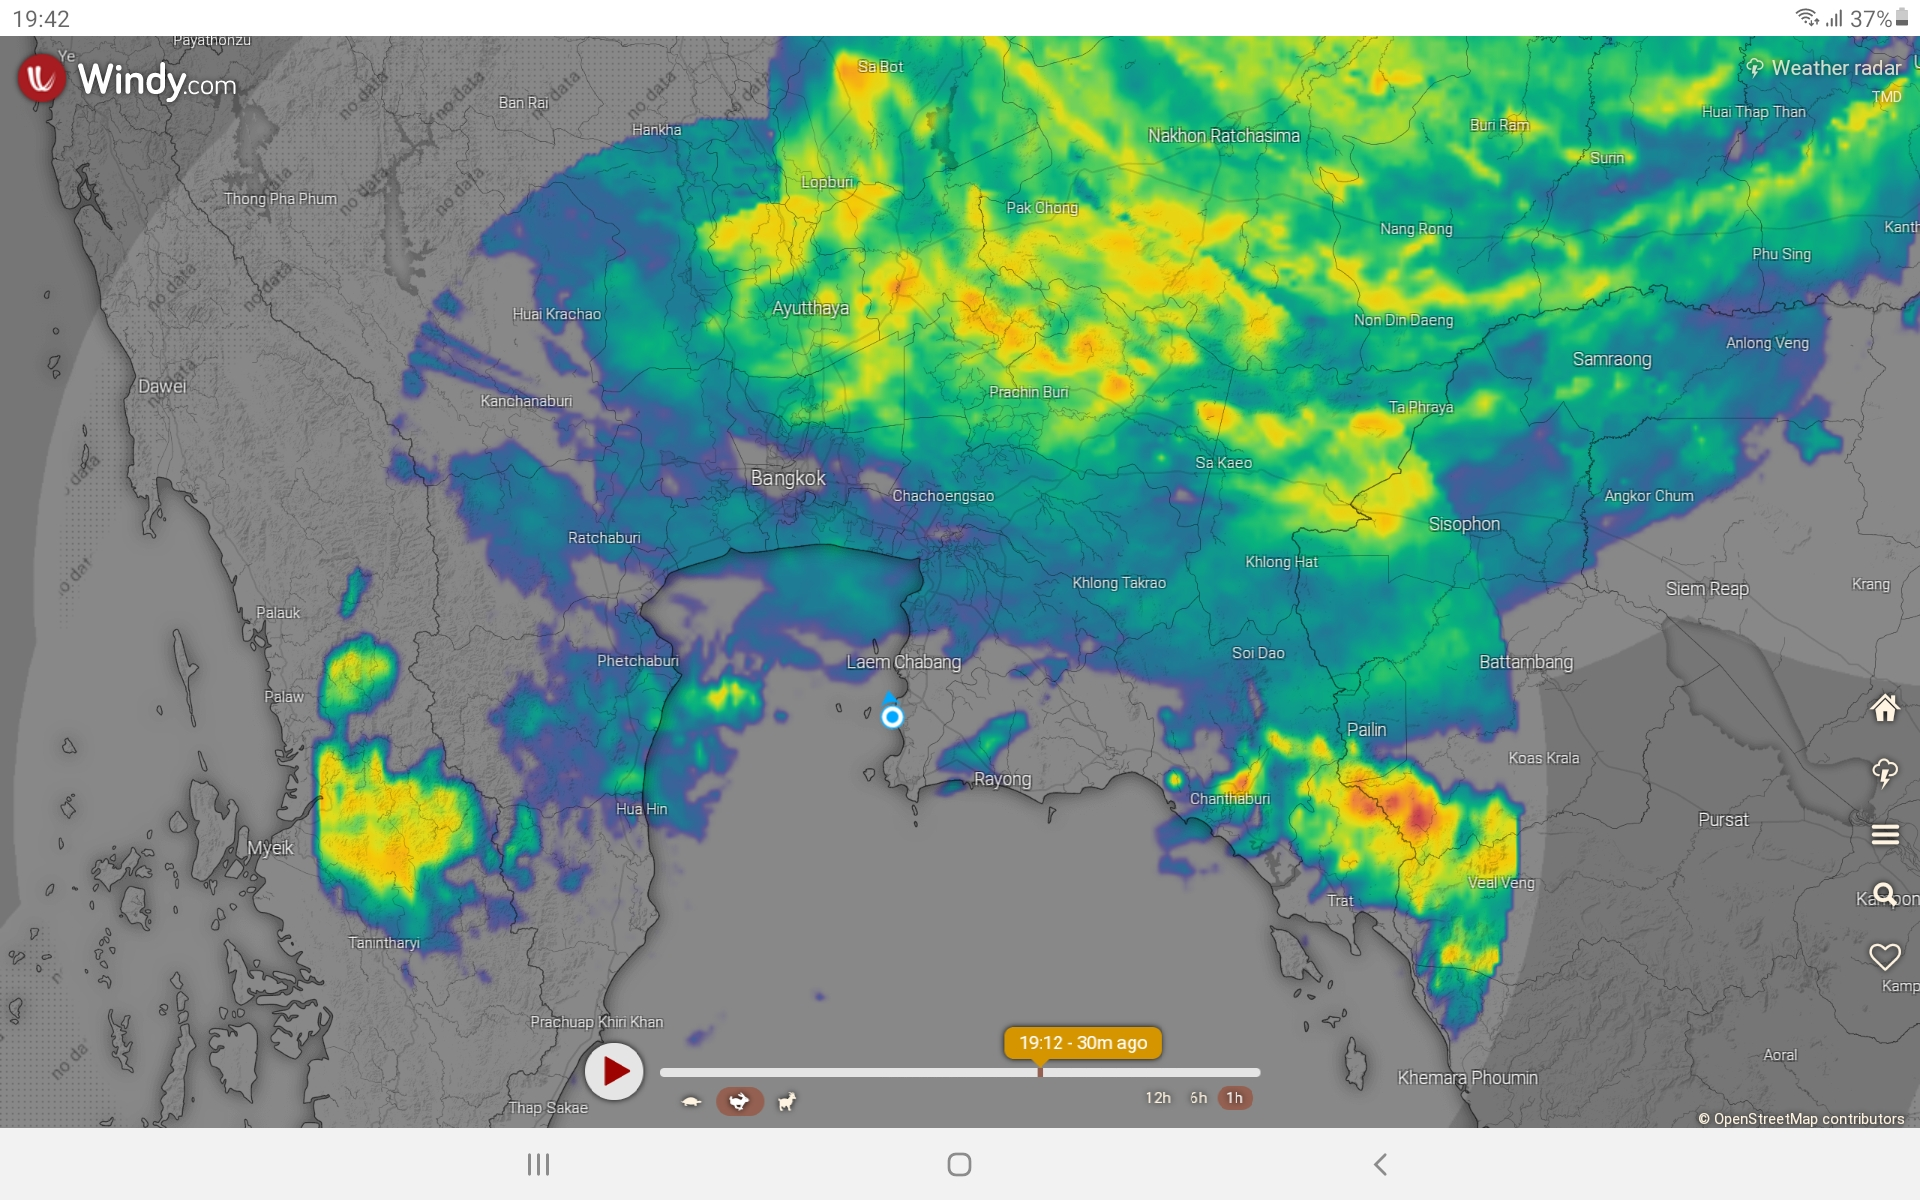 Tropical storm gathers speed, set to strike during weekend-screenshot_20200918-194252_chrome-jpg